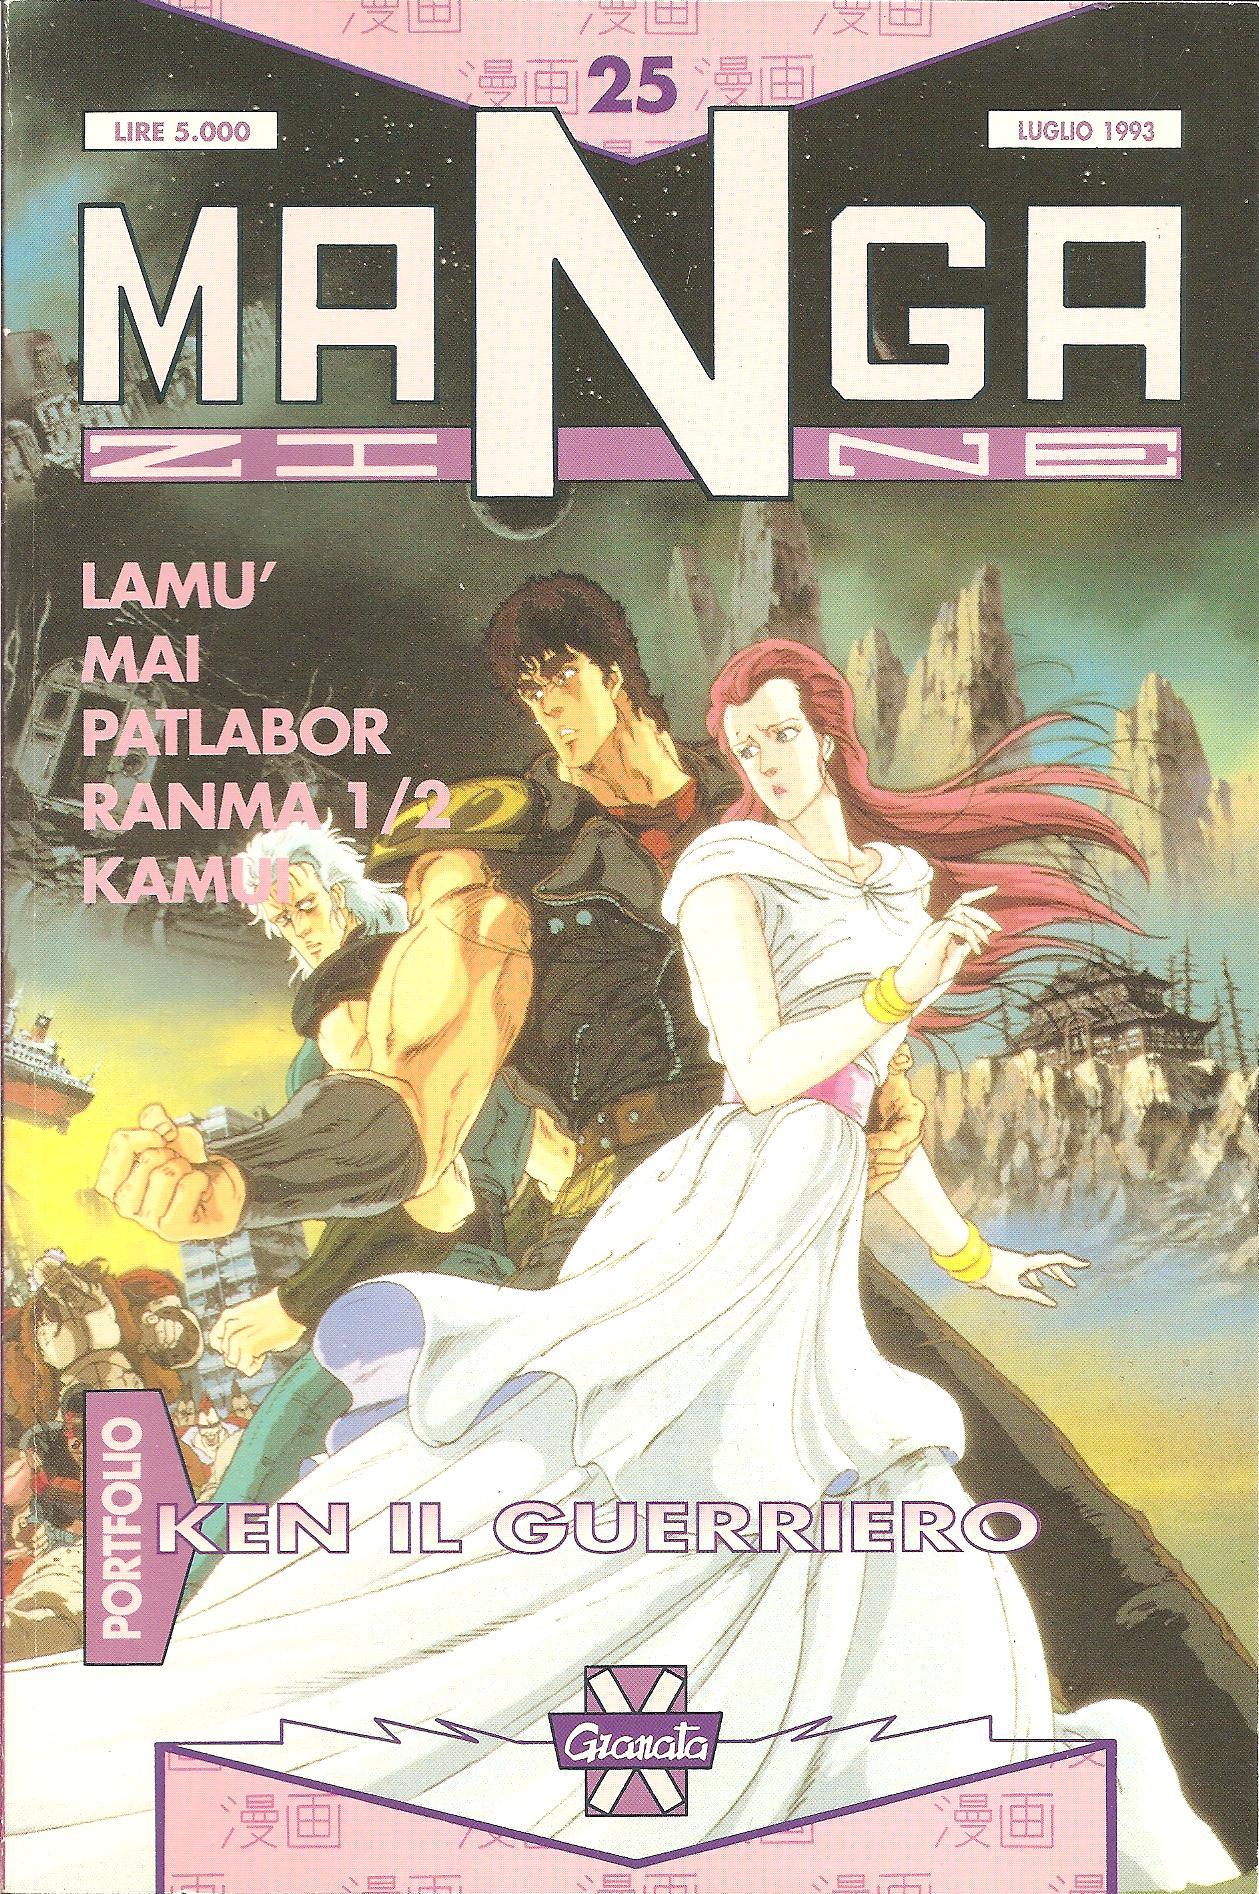 Mangazine n. 25